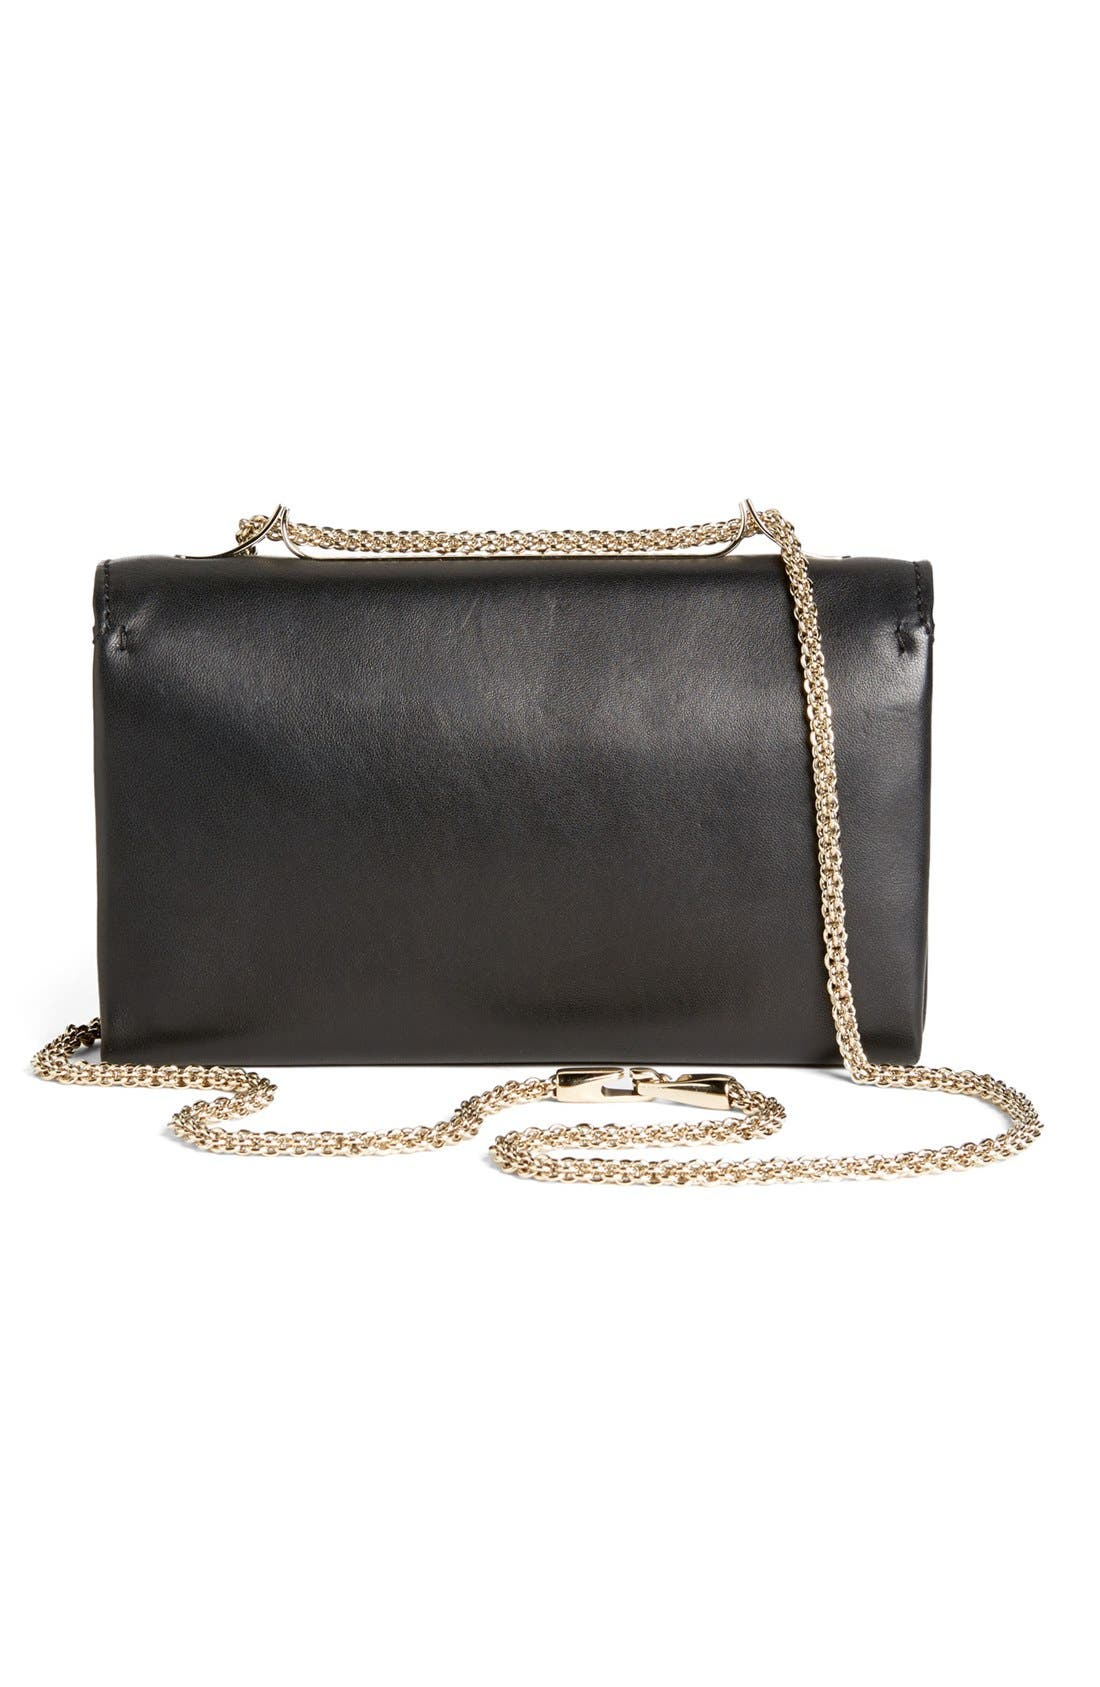 'Va Va Voom' Nappa Leather Shoulder Bag,                             Alternate thumbnail 4, color,                             001